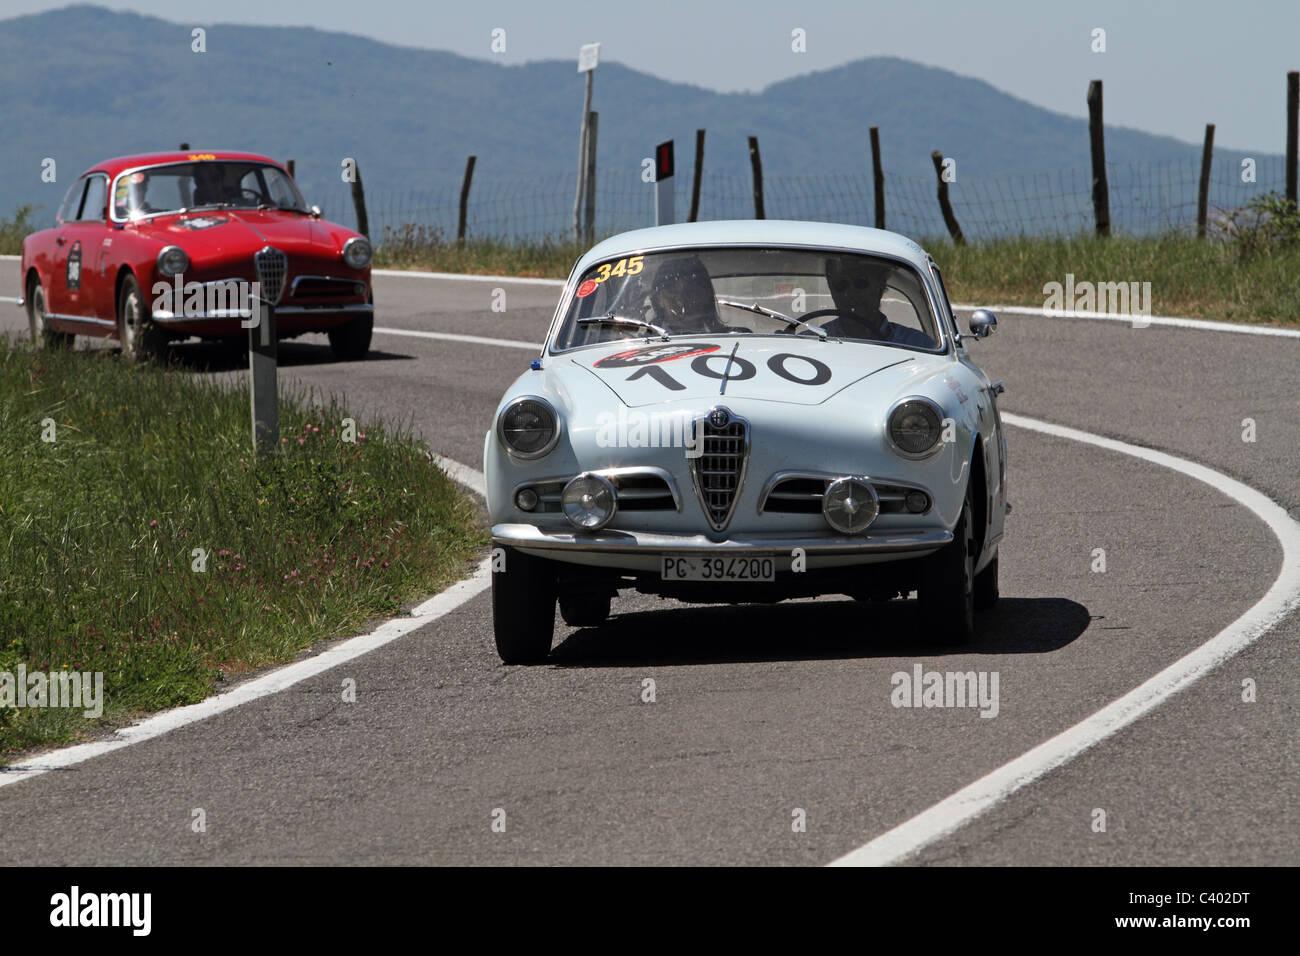 Mille Miglia 2011 Alfa Romeo Giulietta Stockbild